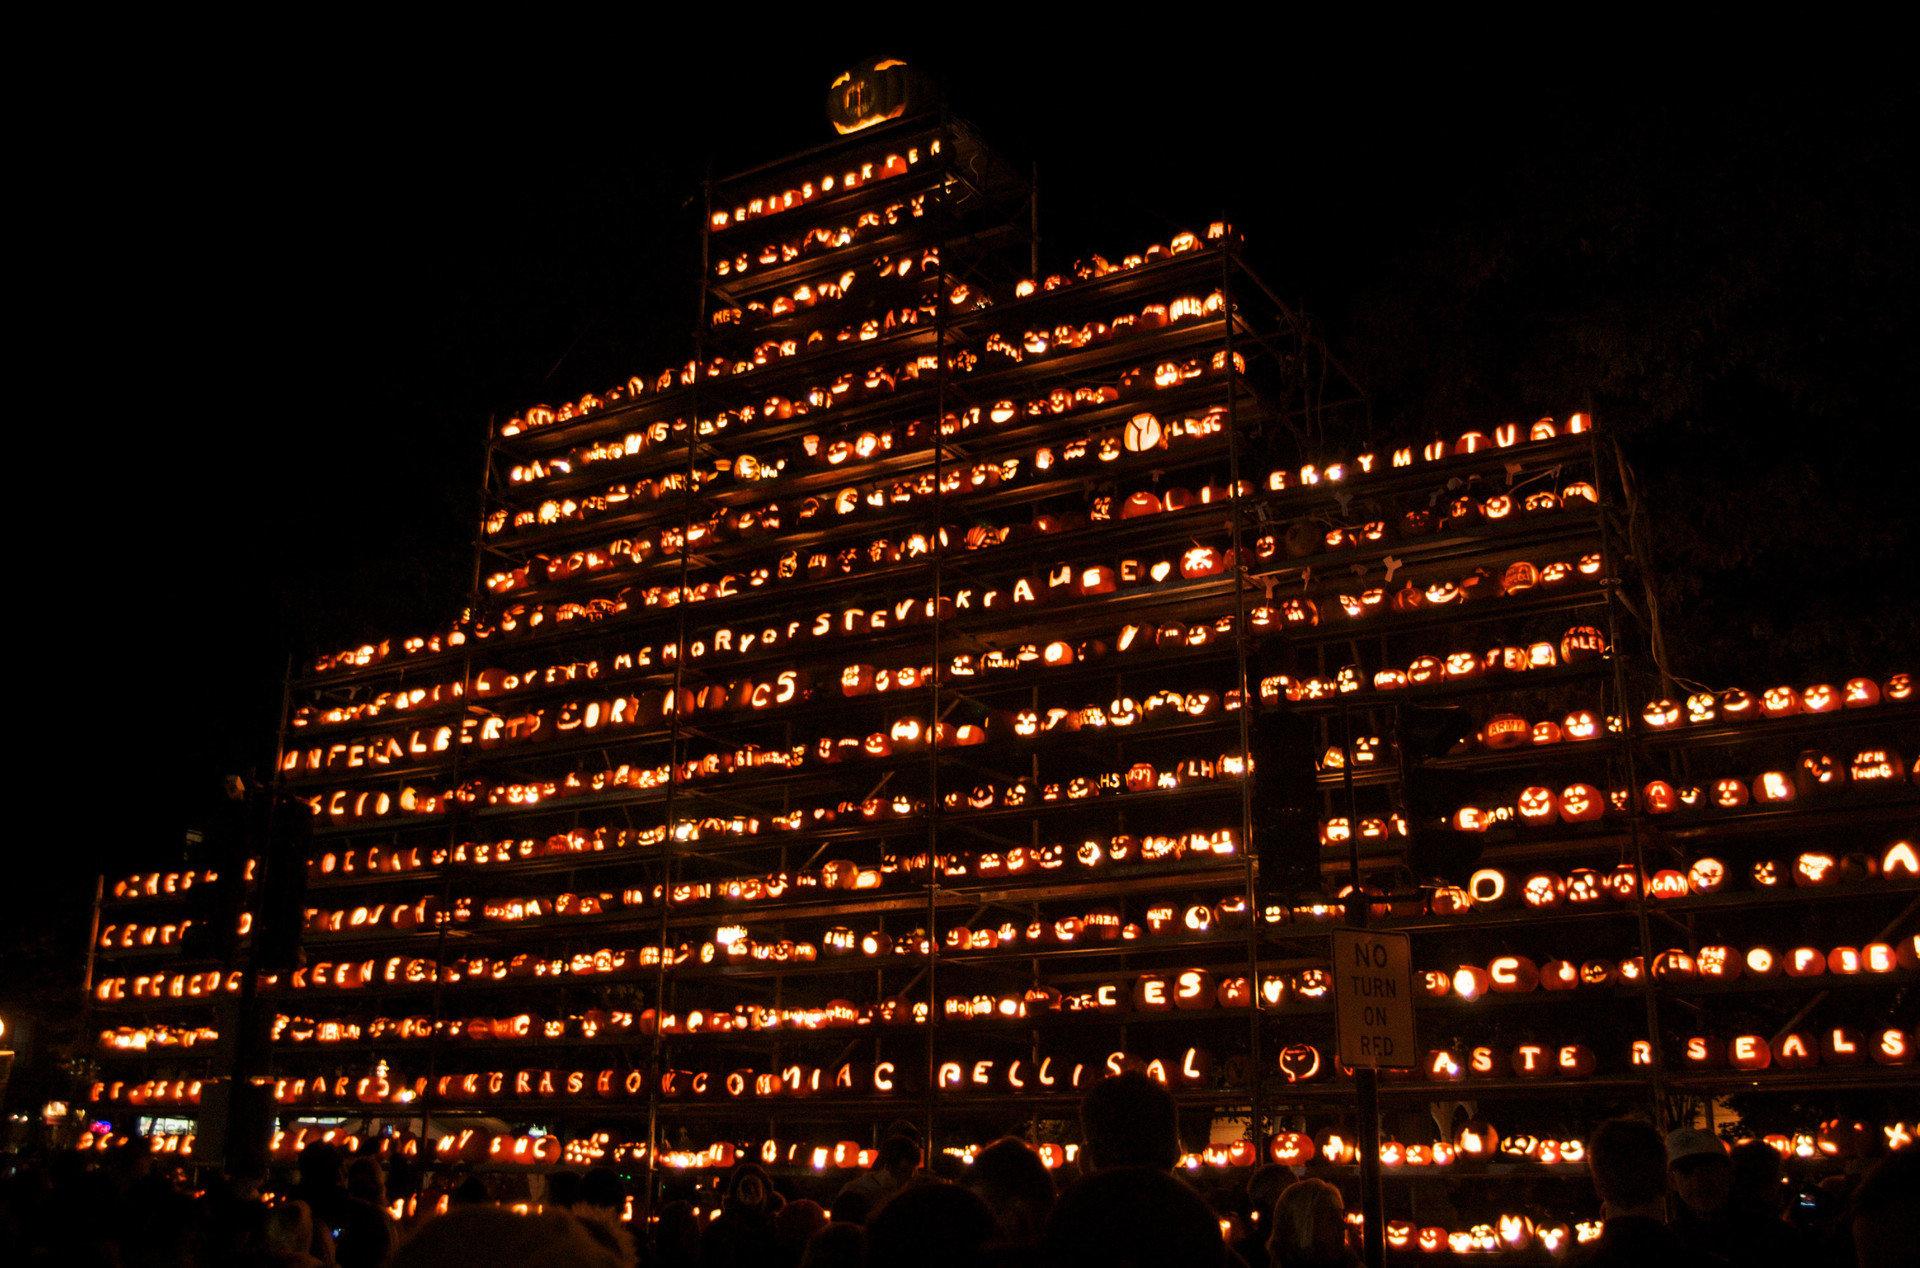 exhibit festival festive glow halloween holiday lights night night lights pumpkins scary Trip Ideas outdoor building City light human settlement skyline metropolis skyscraper cityscape line tower